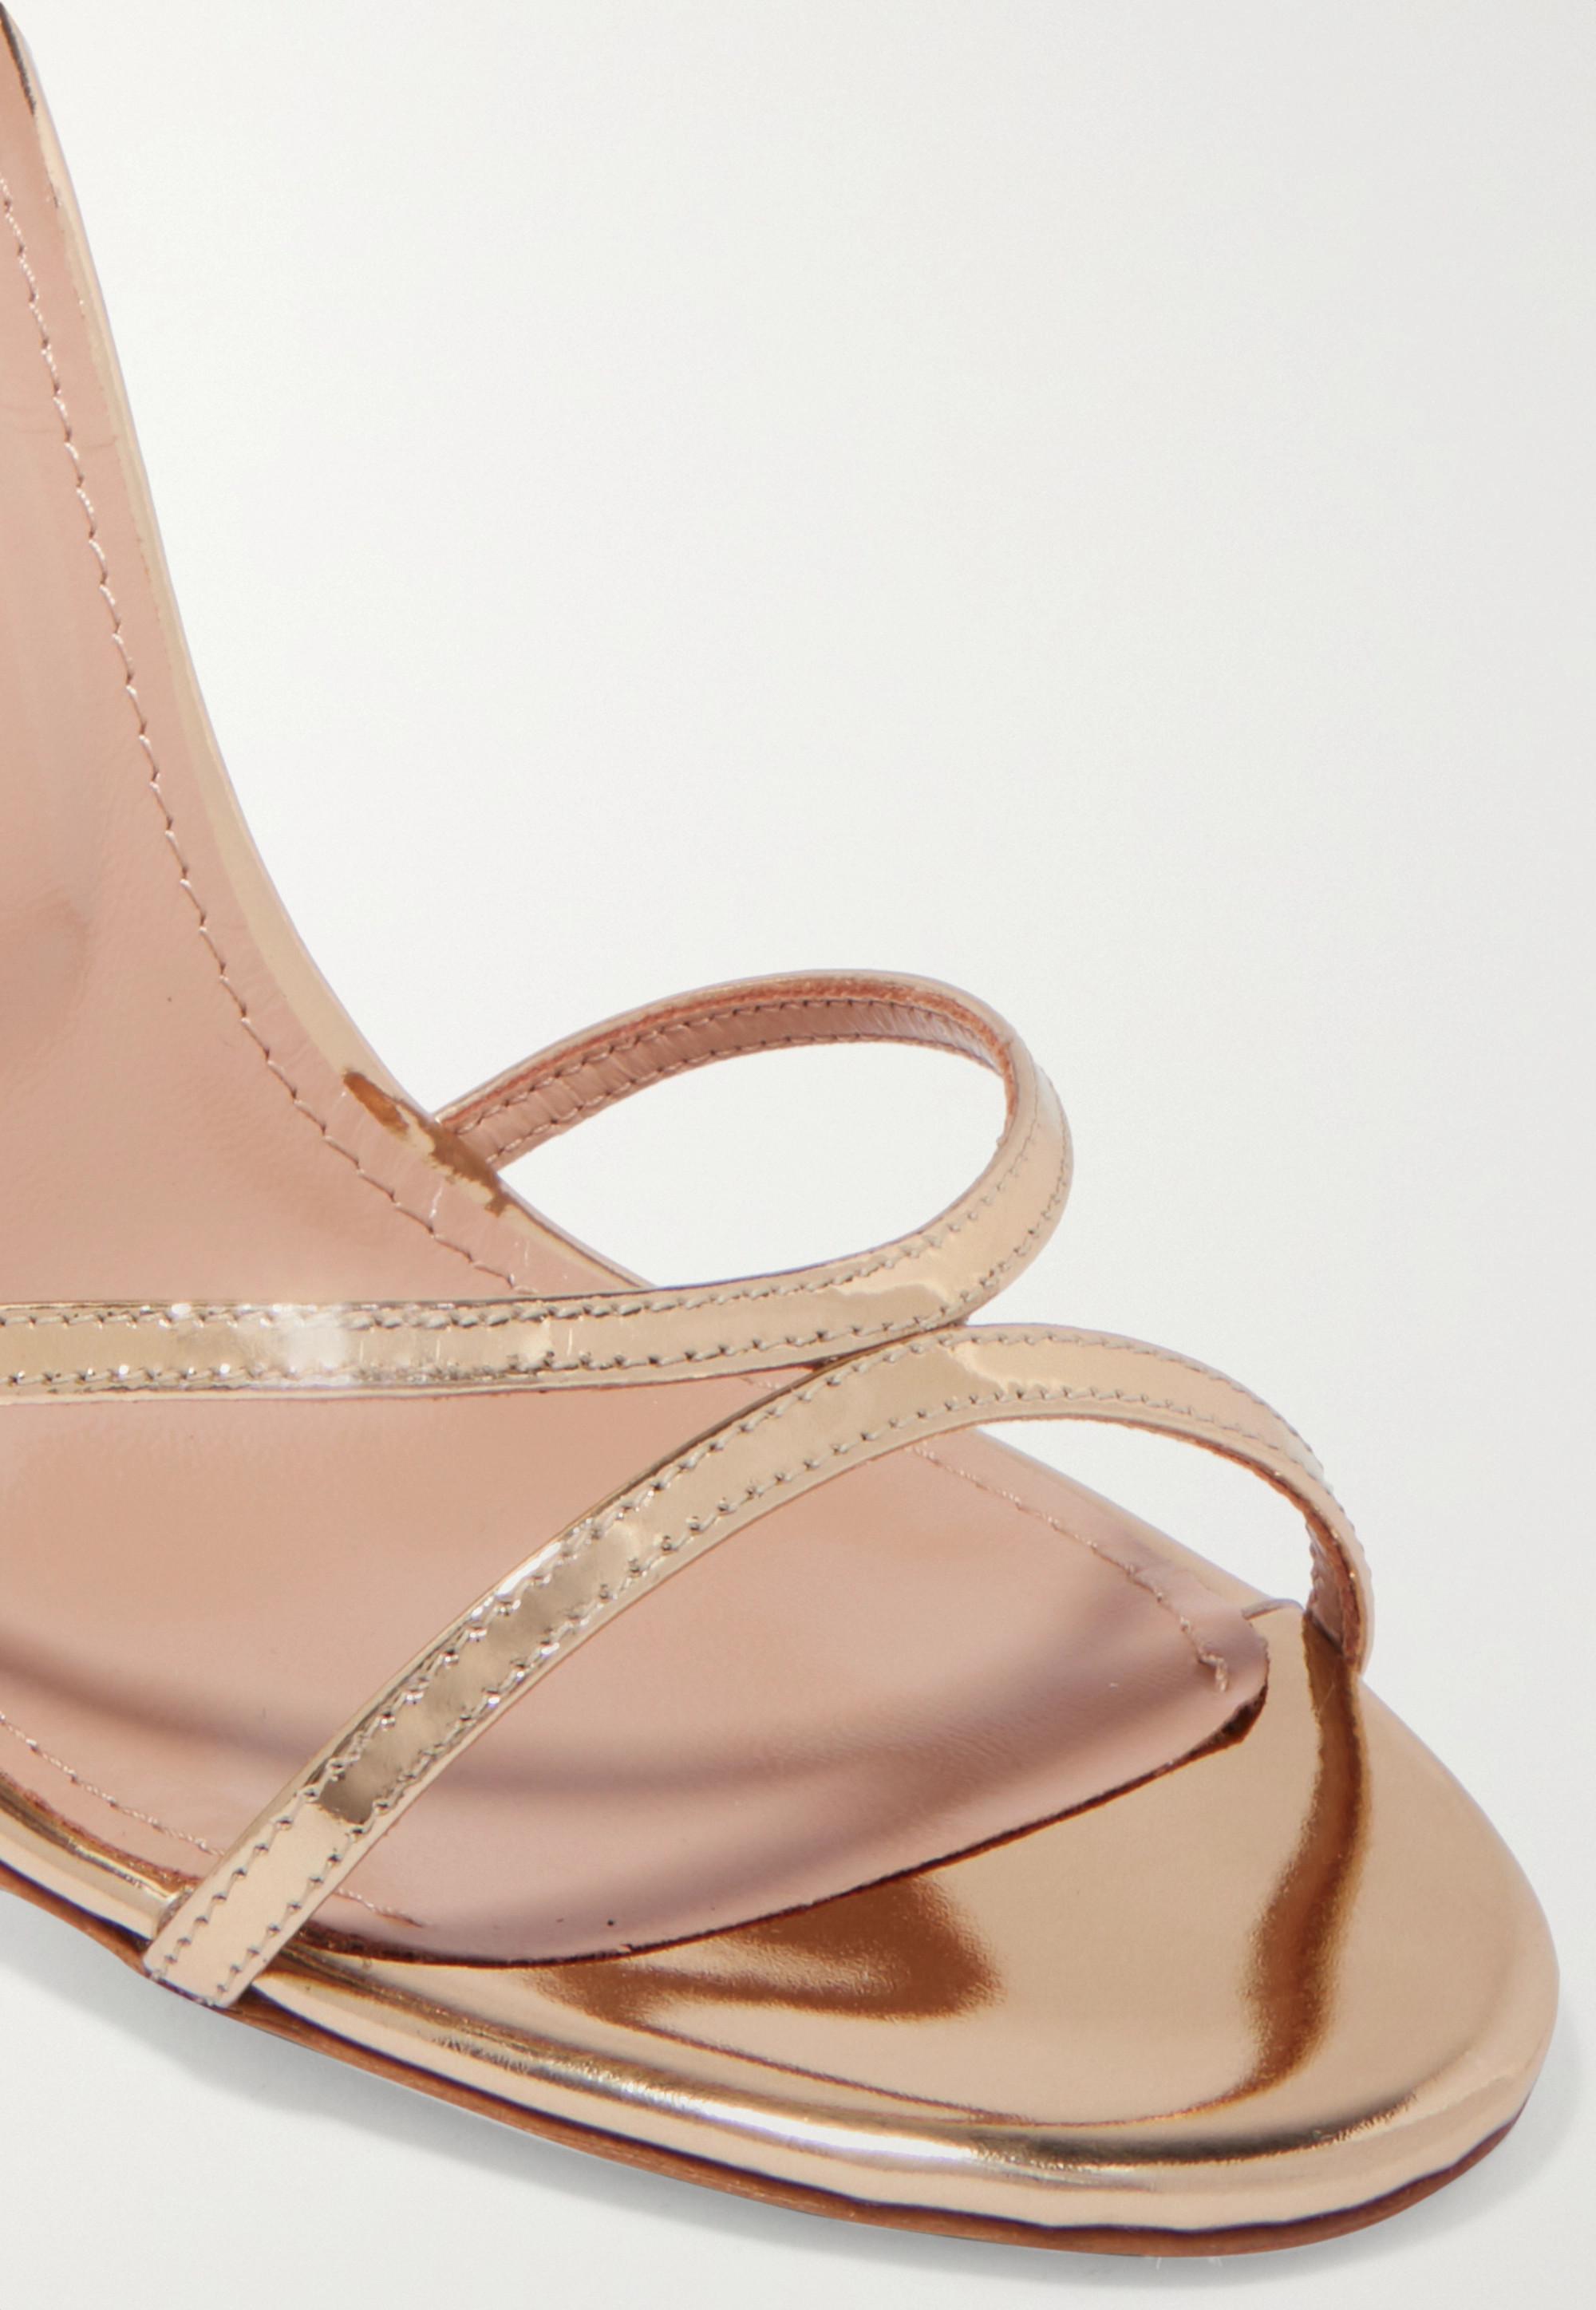 Aquazzura Purist 105 mirrored-leather sandals